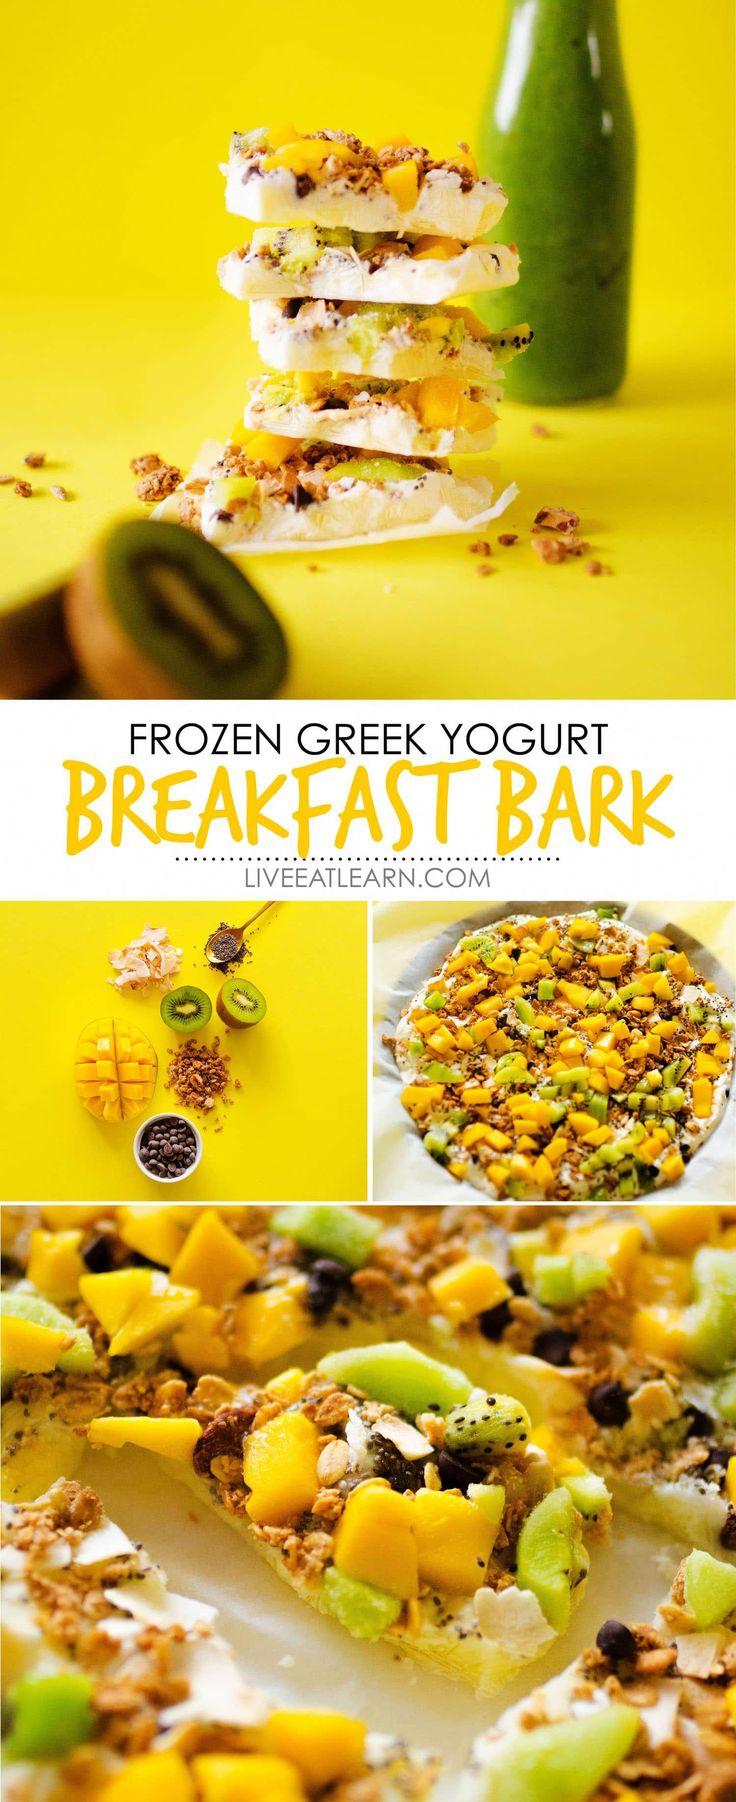 This Frozen Greek Yogurt Breakfast Bark recipe is a quick and healthy vegetarian breakfast recipe th…